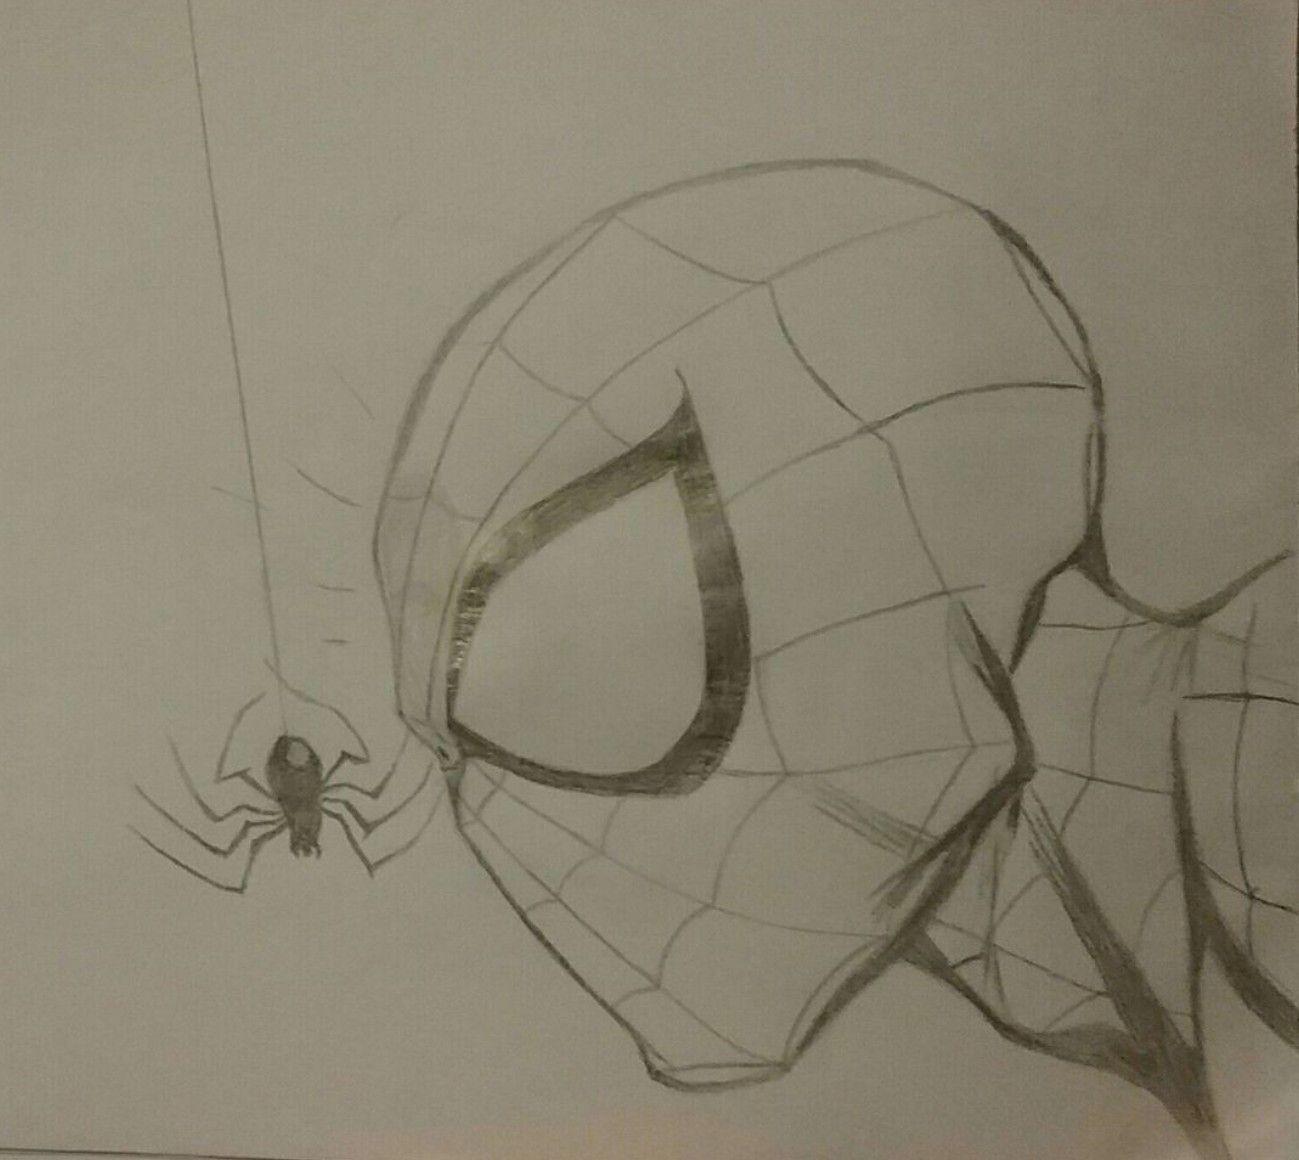 Pin De Frank Chavez Em Spiderman Dibujo Pixar Desenhos Marvel